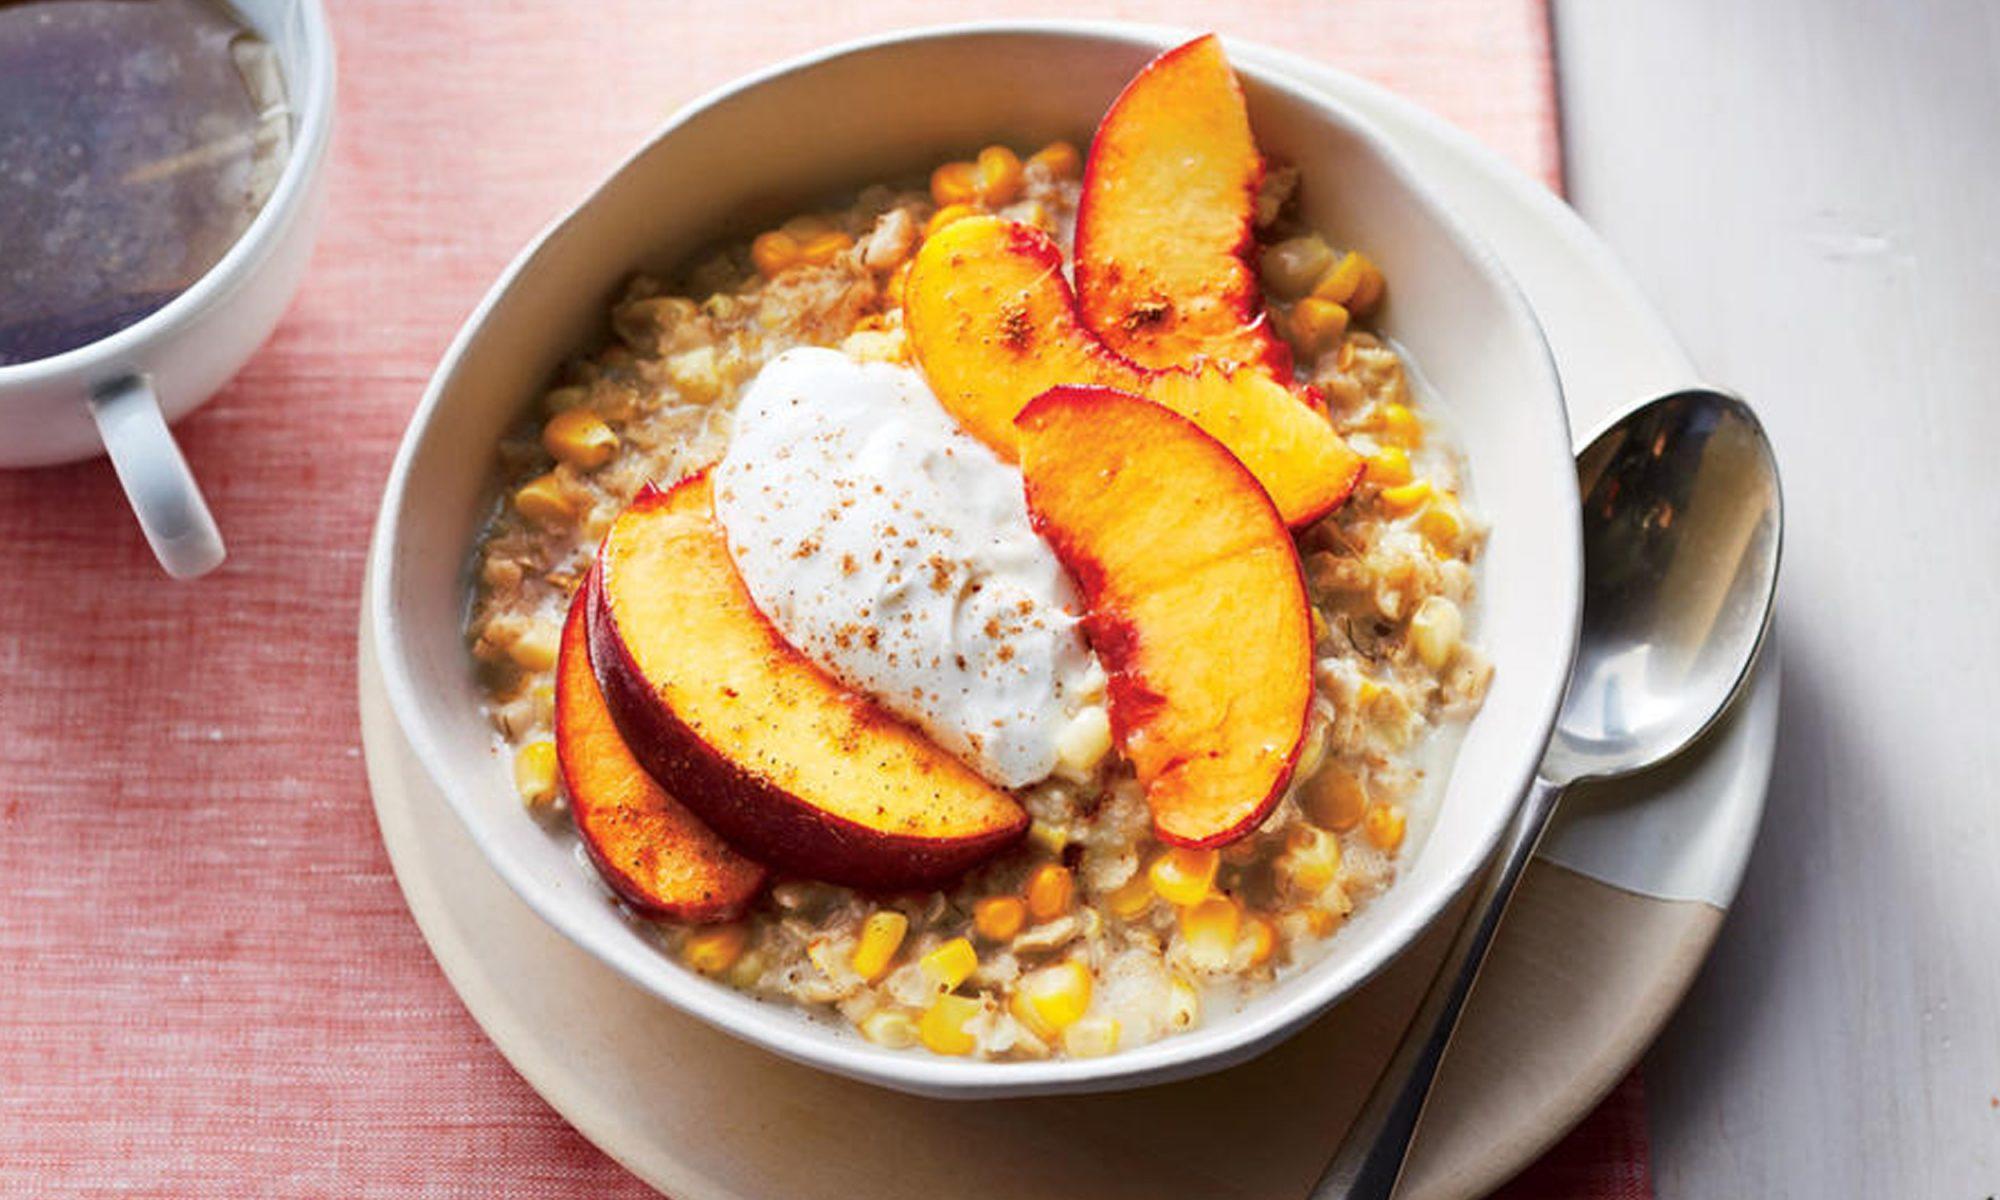 EC: Sweet Corn Oatmeal with Peaches